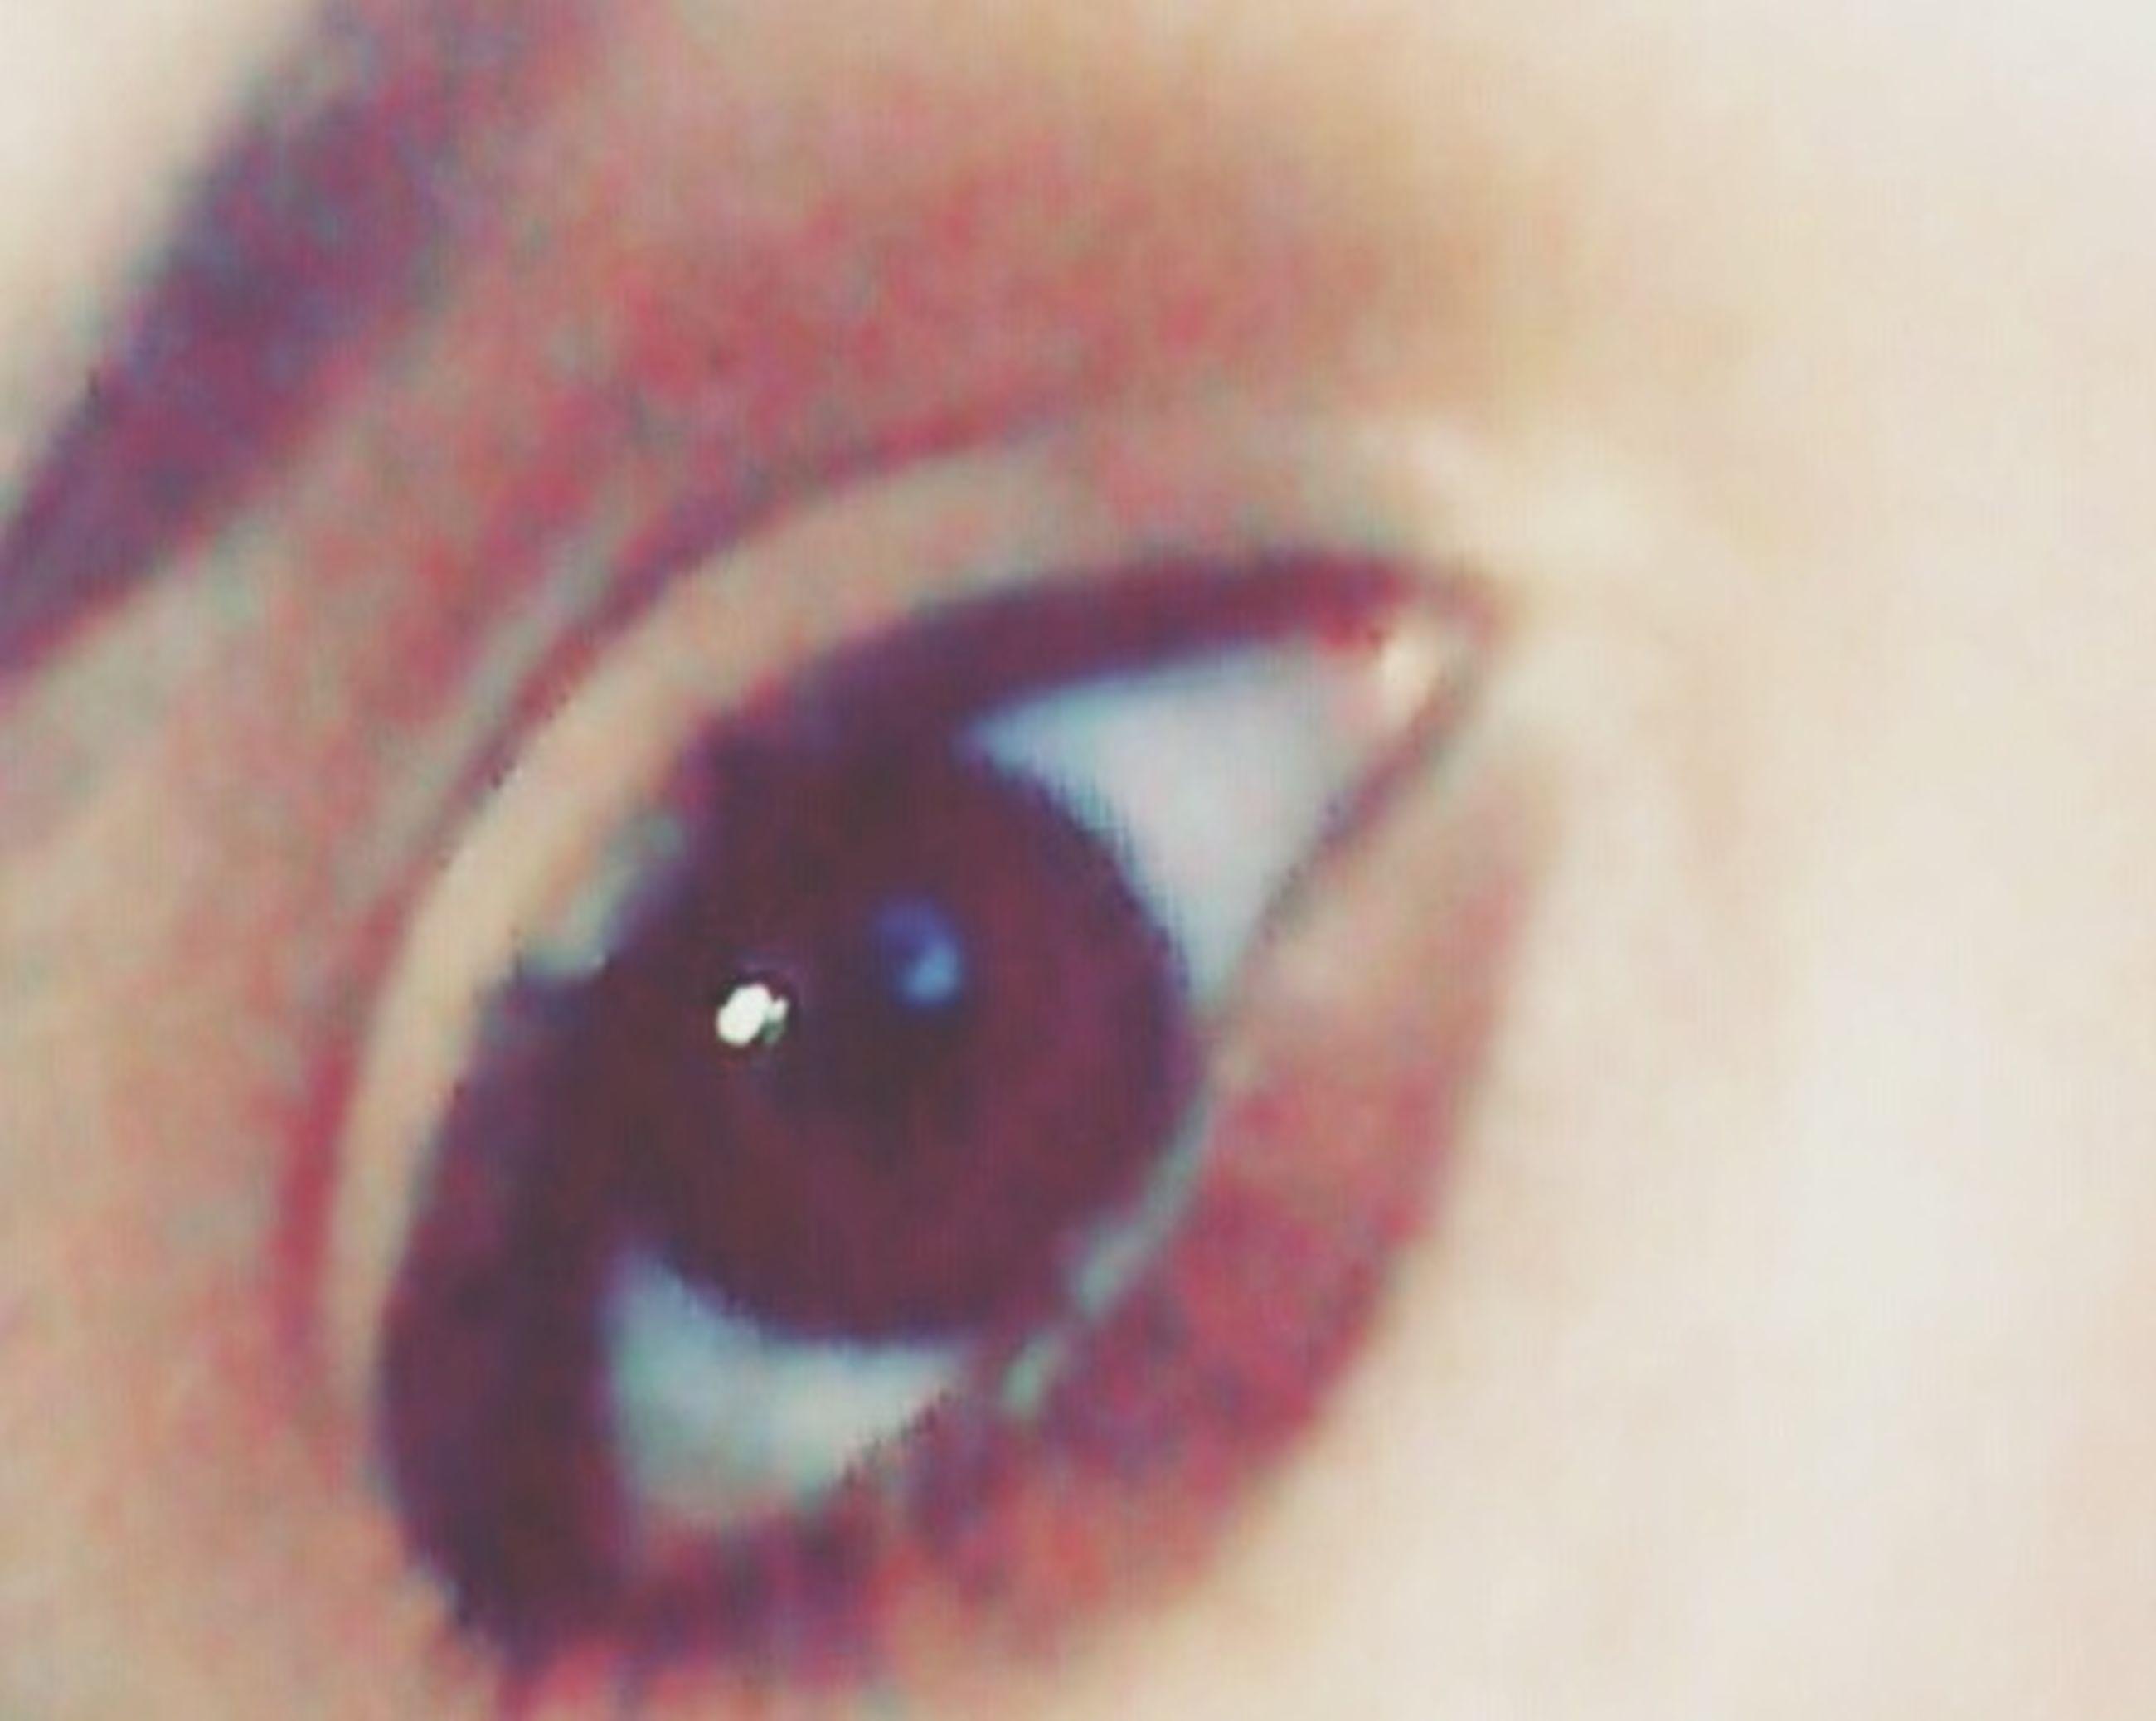 human eye, eyesight, extreme close-up, eyelash, looking at camera, eyeball, vision, person, orange color, iris - eye, red, full frame, extreme close up, human skin, eyeshadow